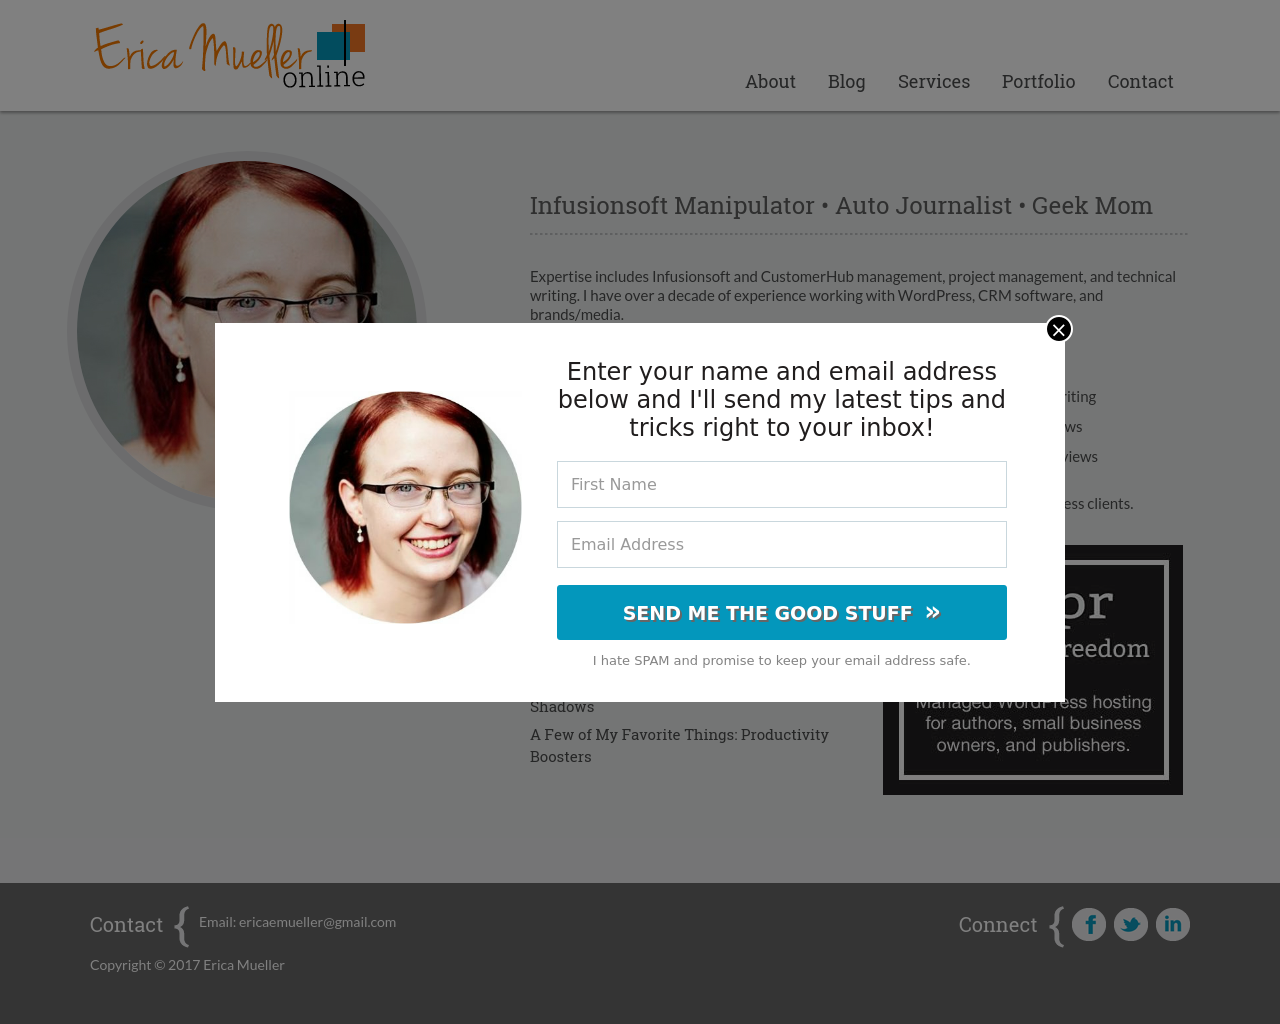 Erica-Mueller-Online-Advertising-Reviews-Pricing